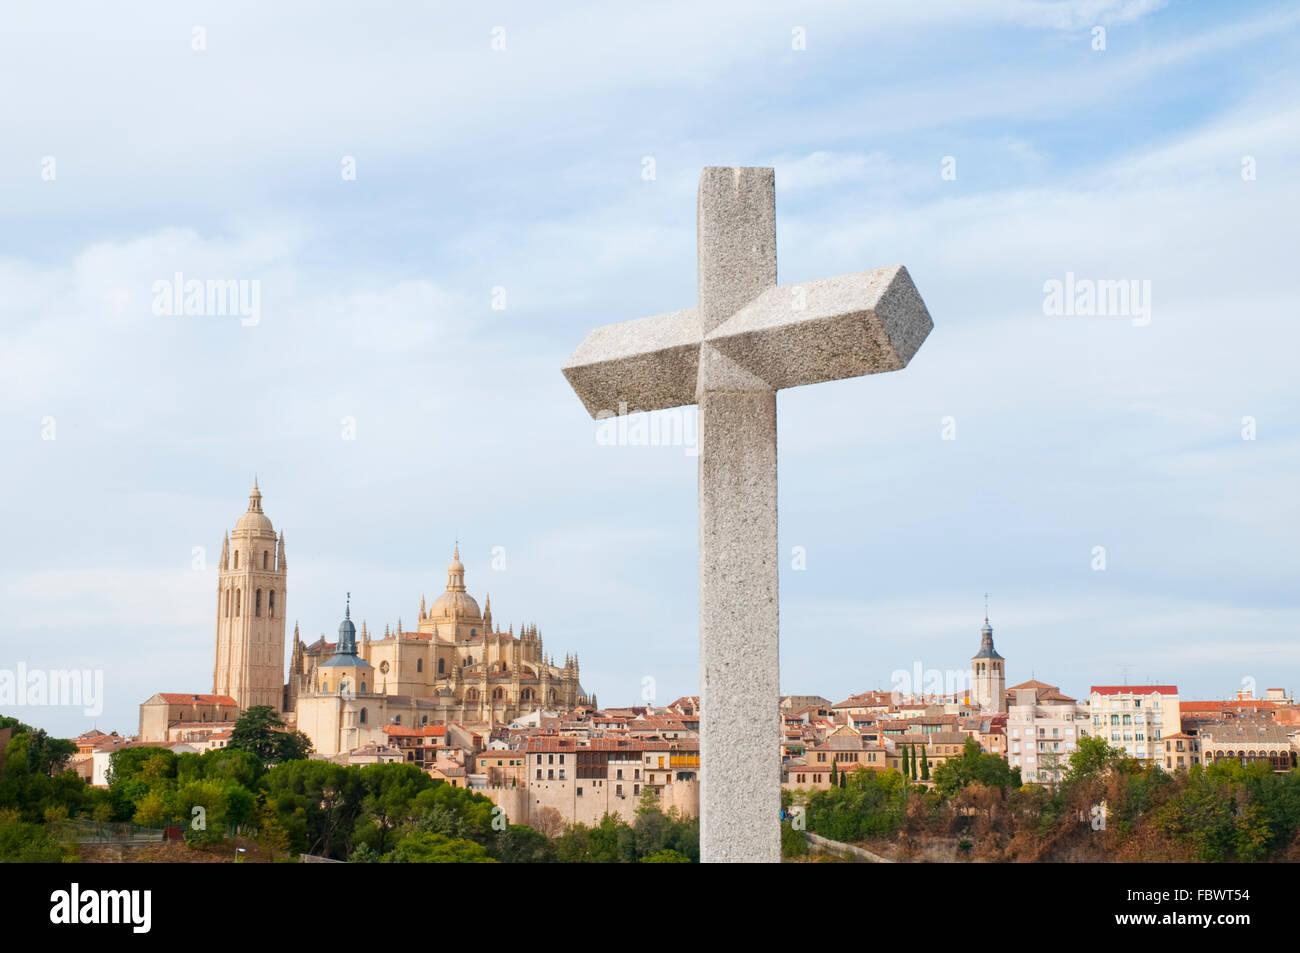 Overview from La Piedad. Segovia, Castilla Leon, Spain. - Stock Image